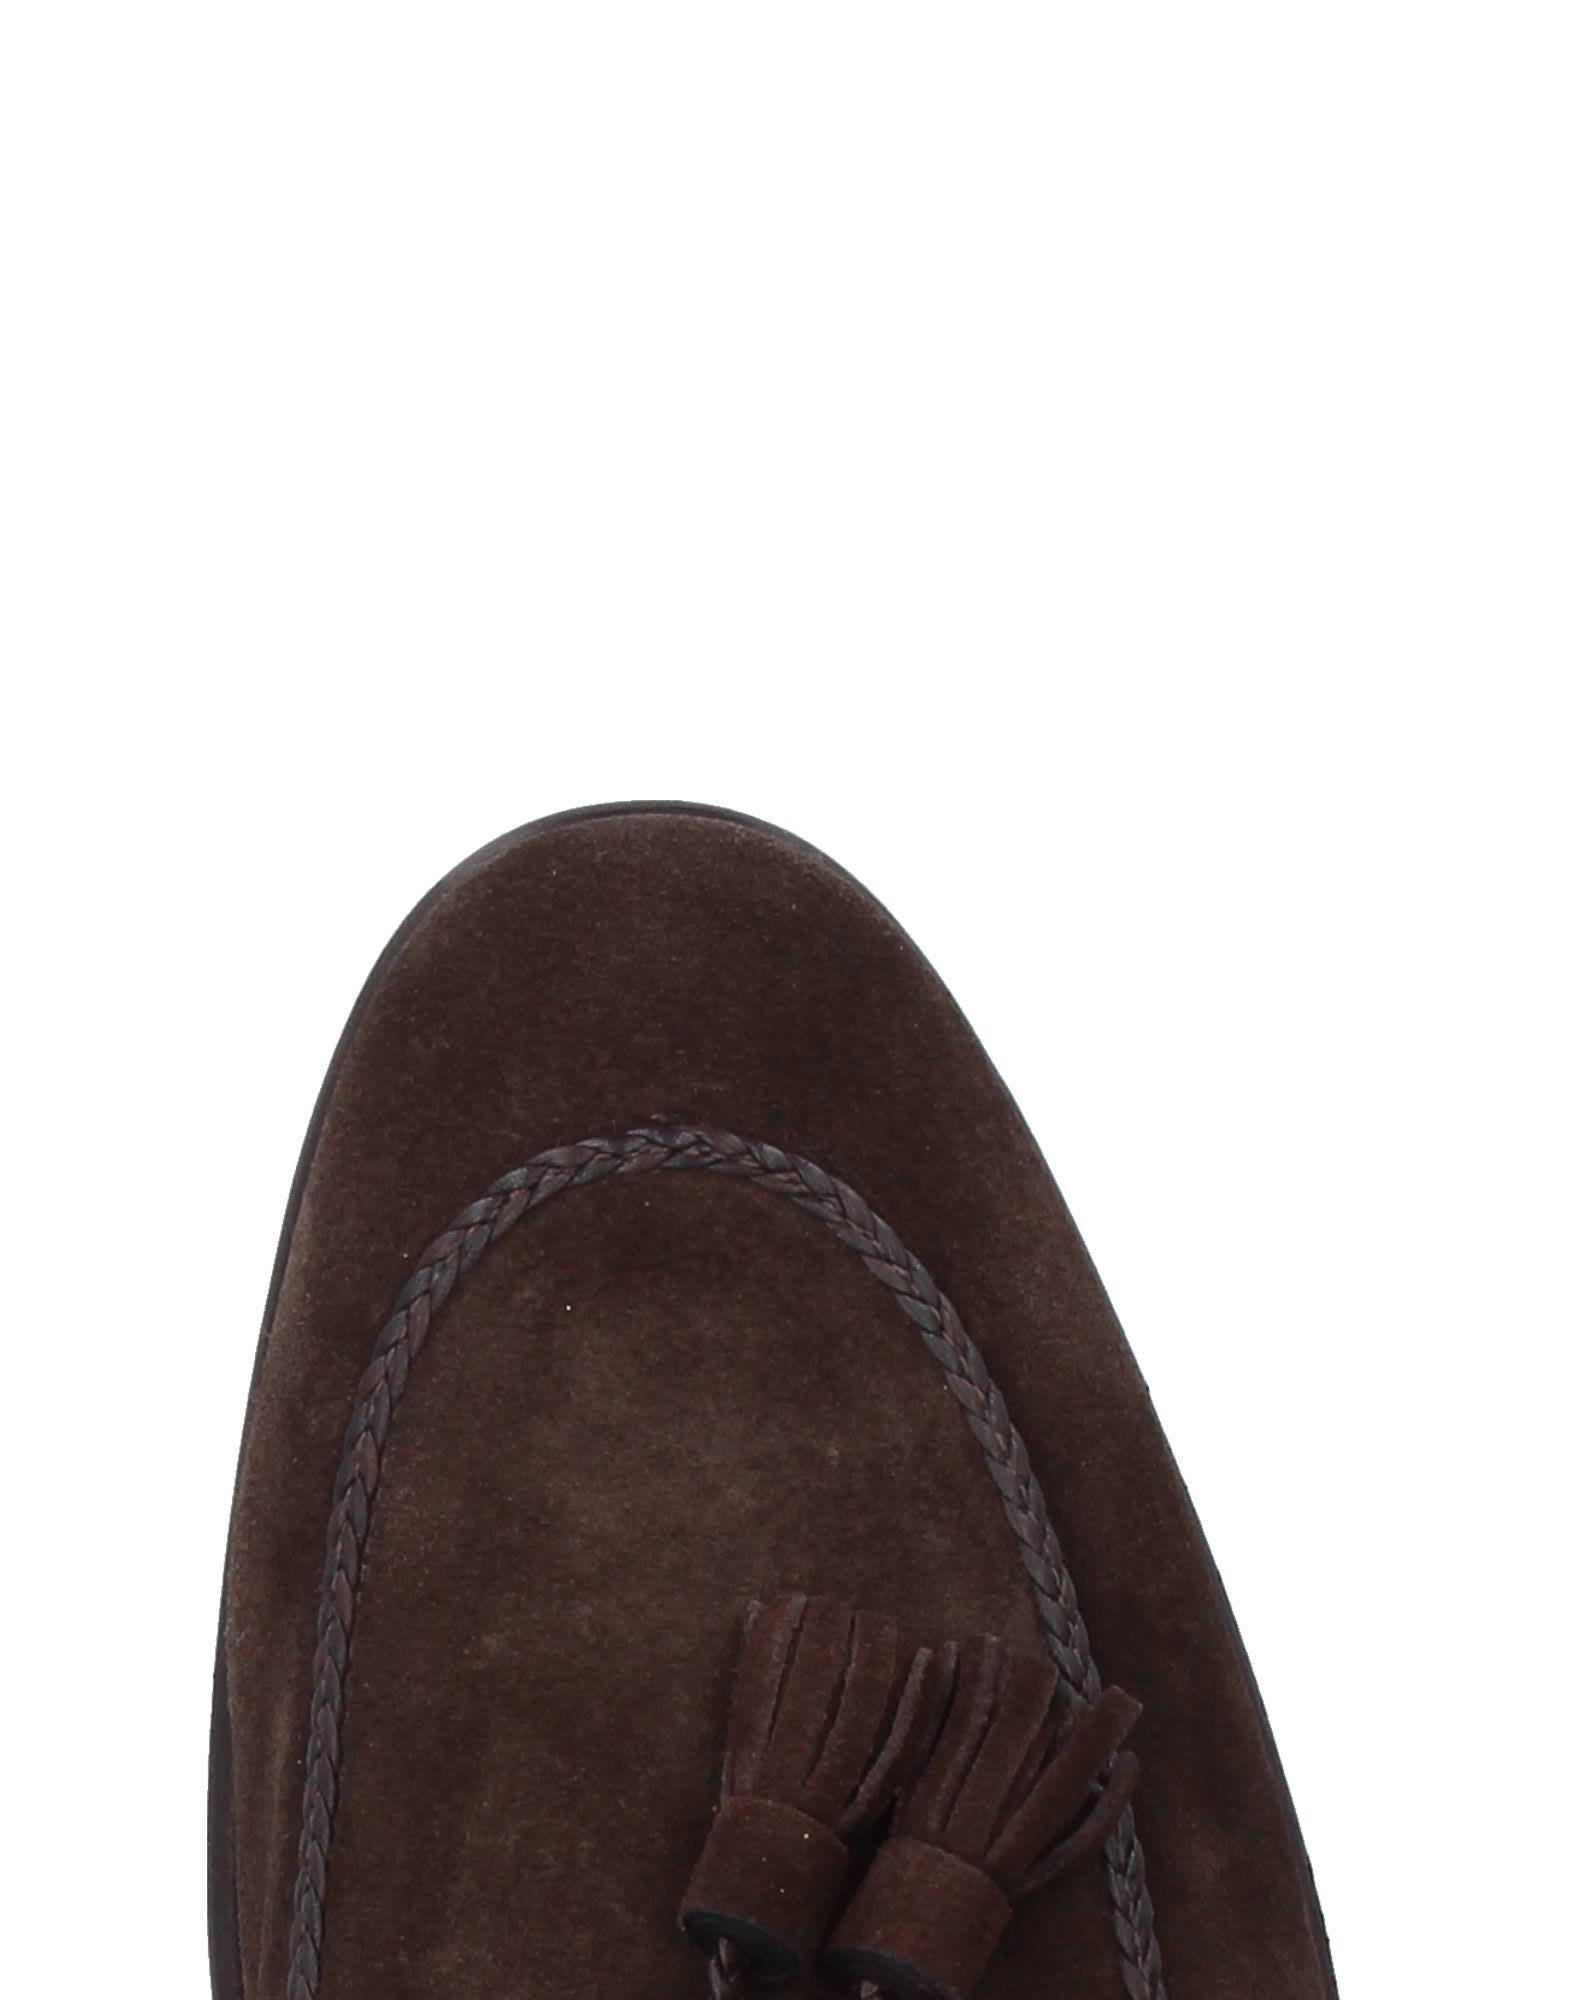 A.Testoni Mokassins Mokassins Mokassins Herren  11408362RH Heiße Schuhe d29e63